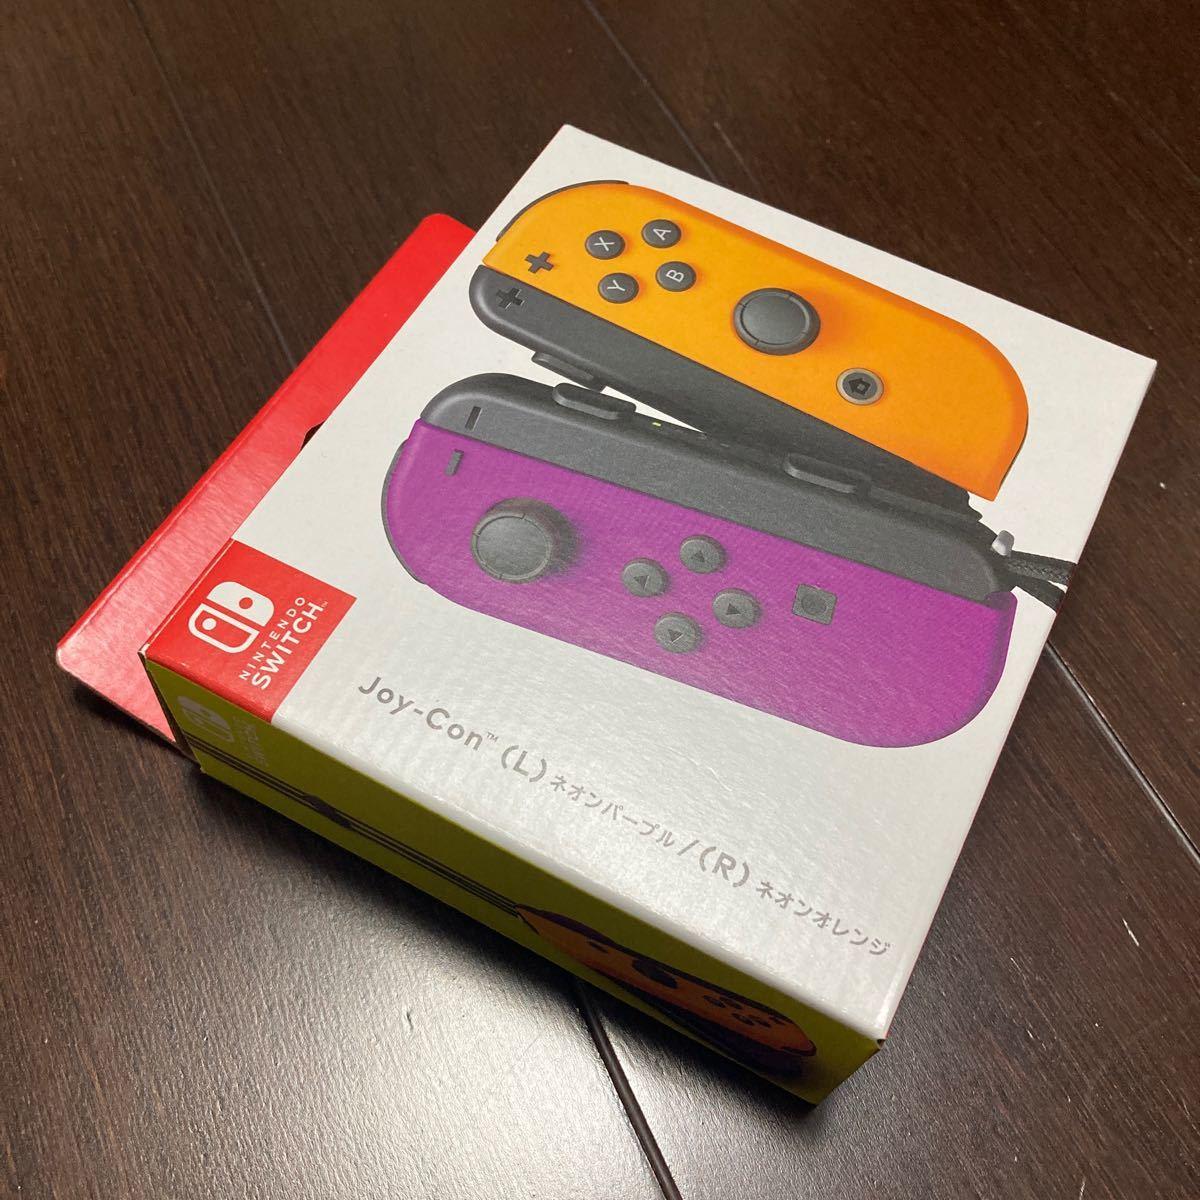 Joy-Conジョイコン ネオンパープル ネオンオレンジ新品未使用品 Nintendo Switch Joy-Con (L)